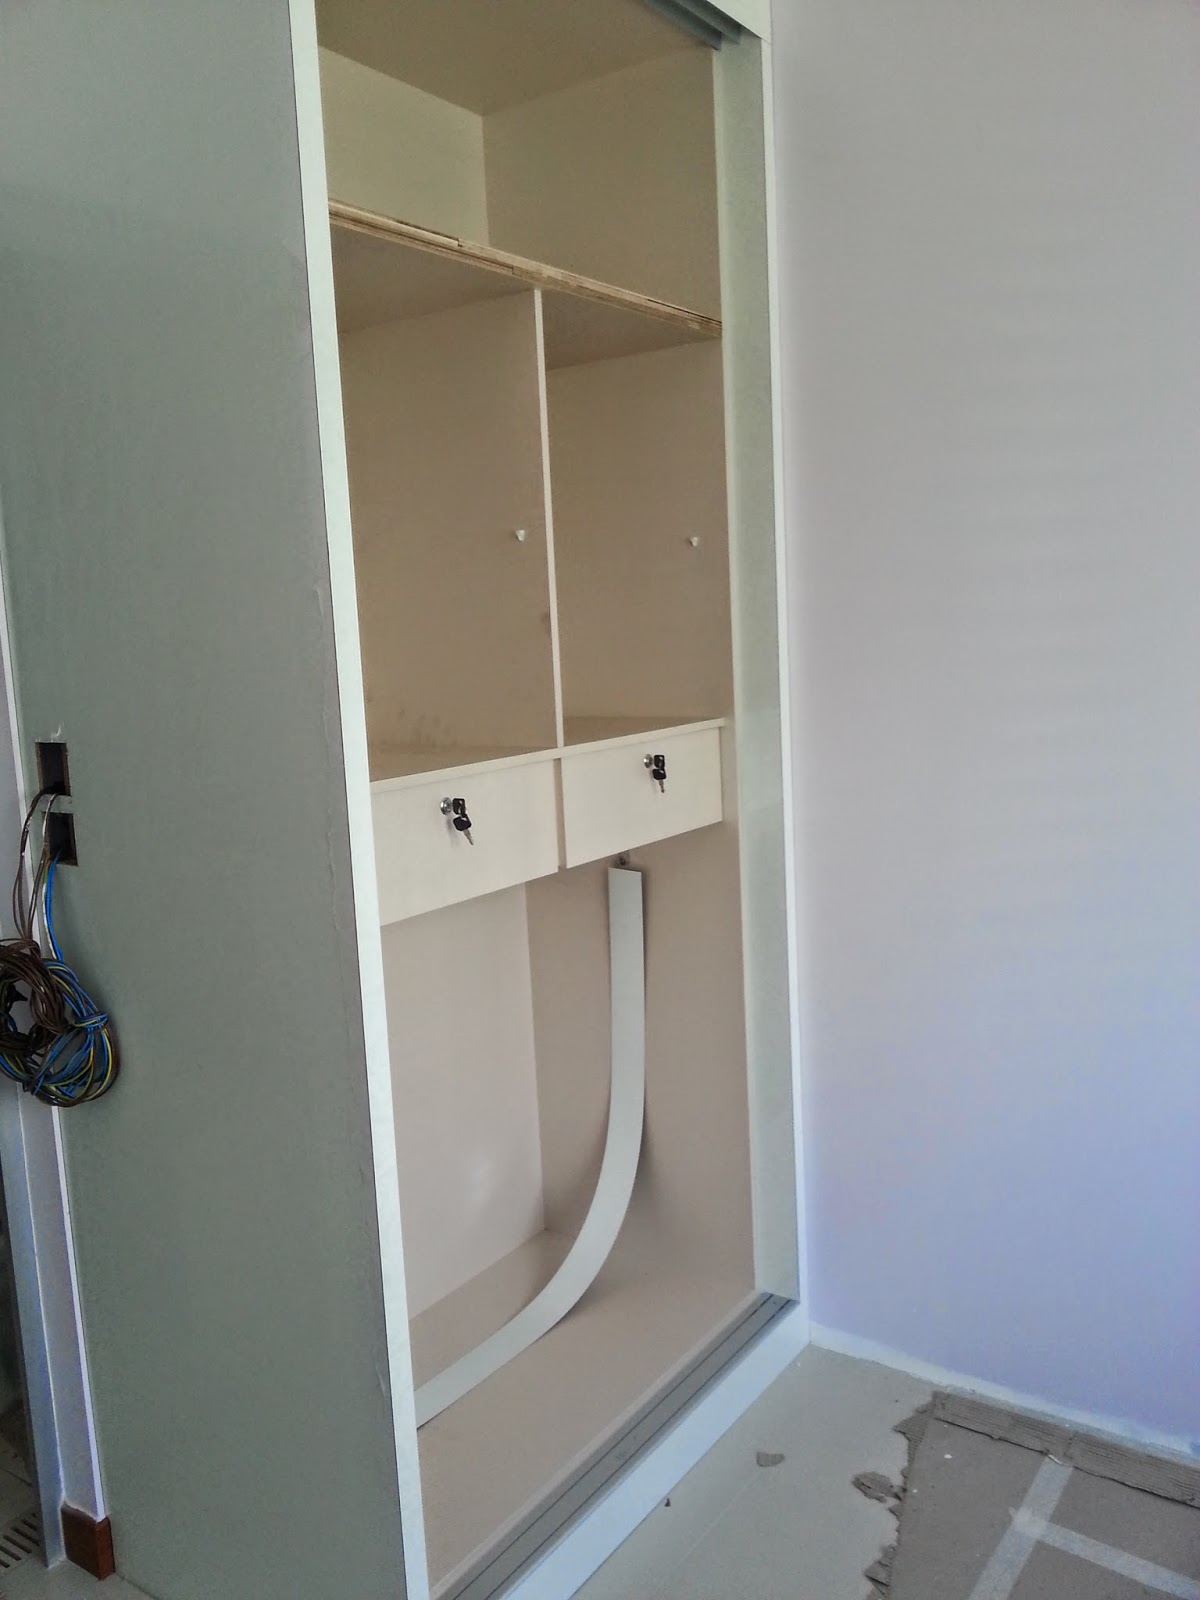 Hdb Two Room Bto 47: HDB 2 Room BTO Renovation Small Space ,big Ideas: HDB 2